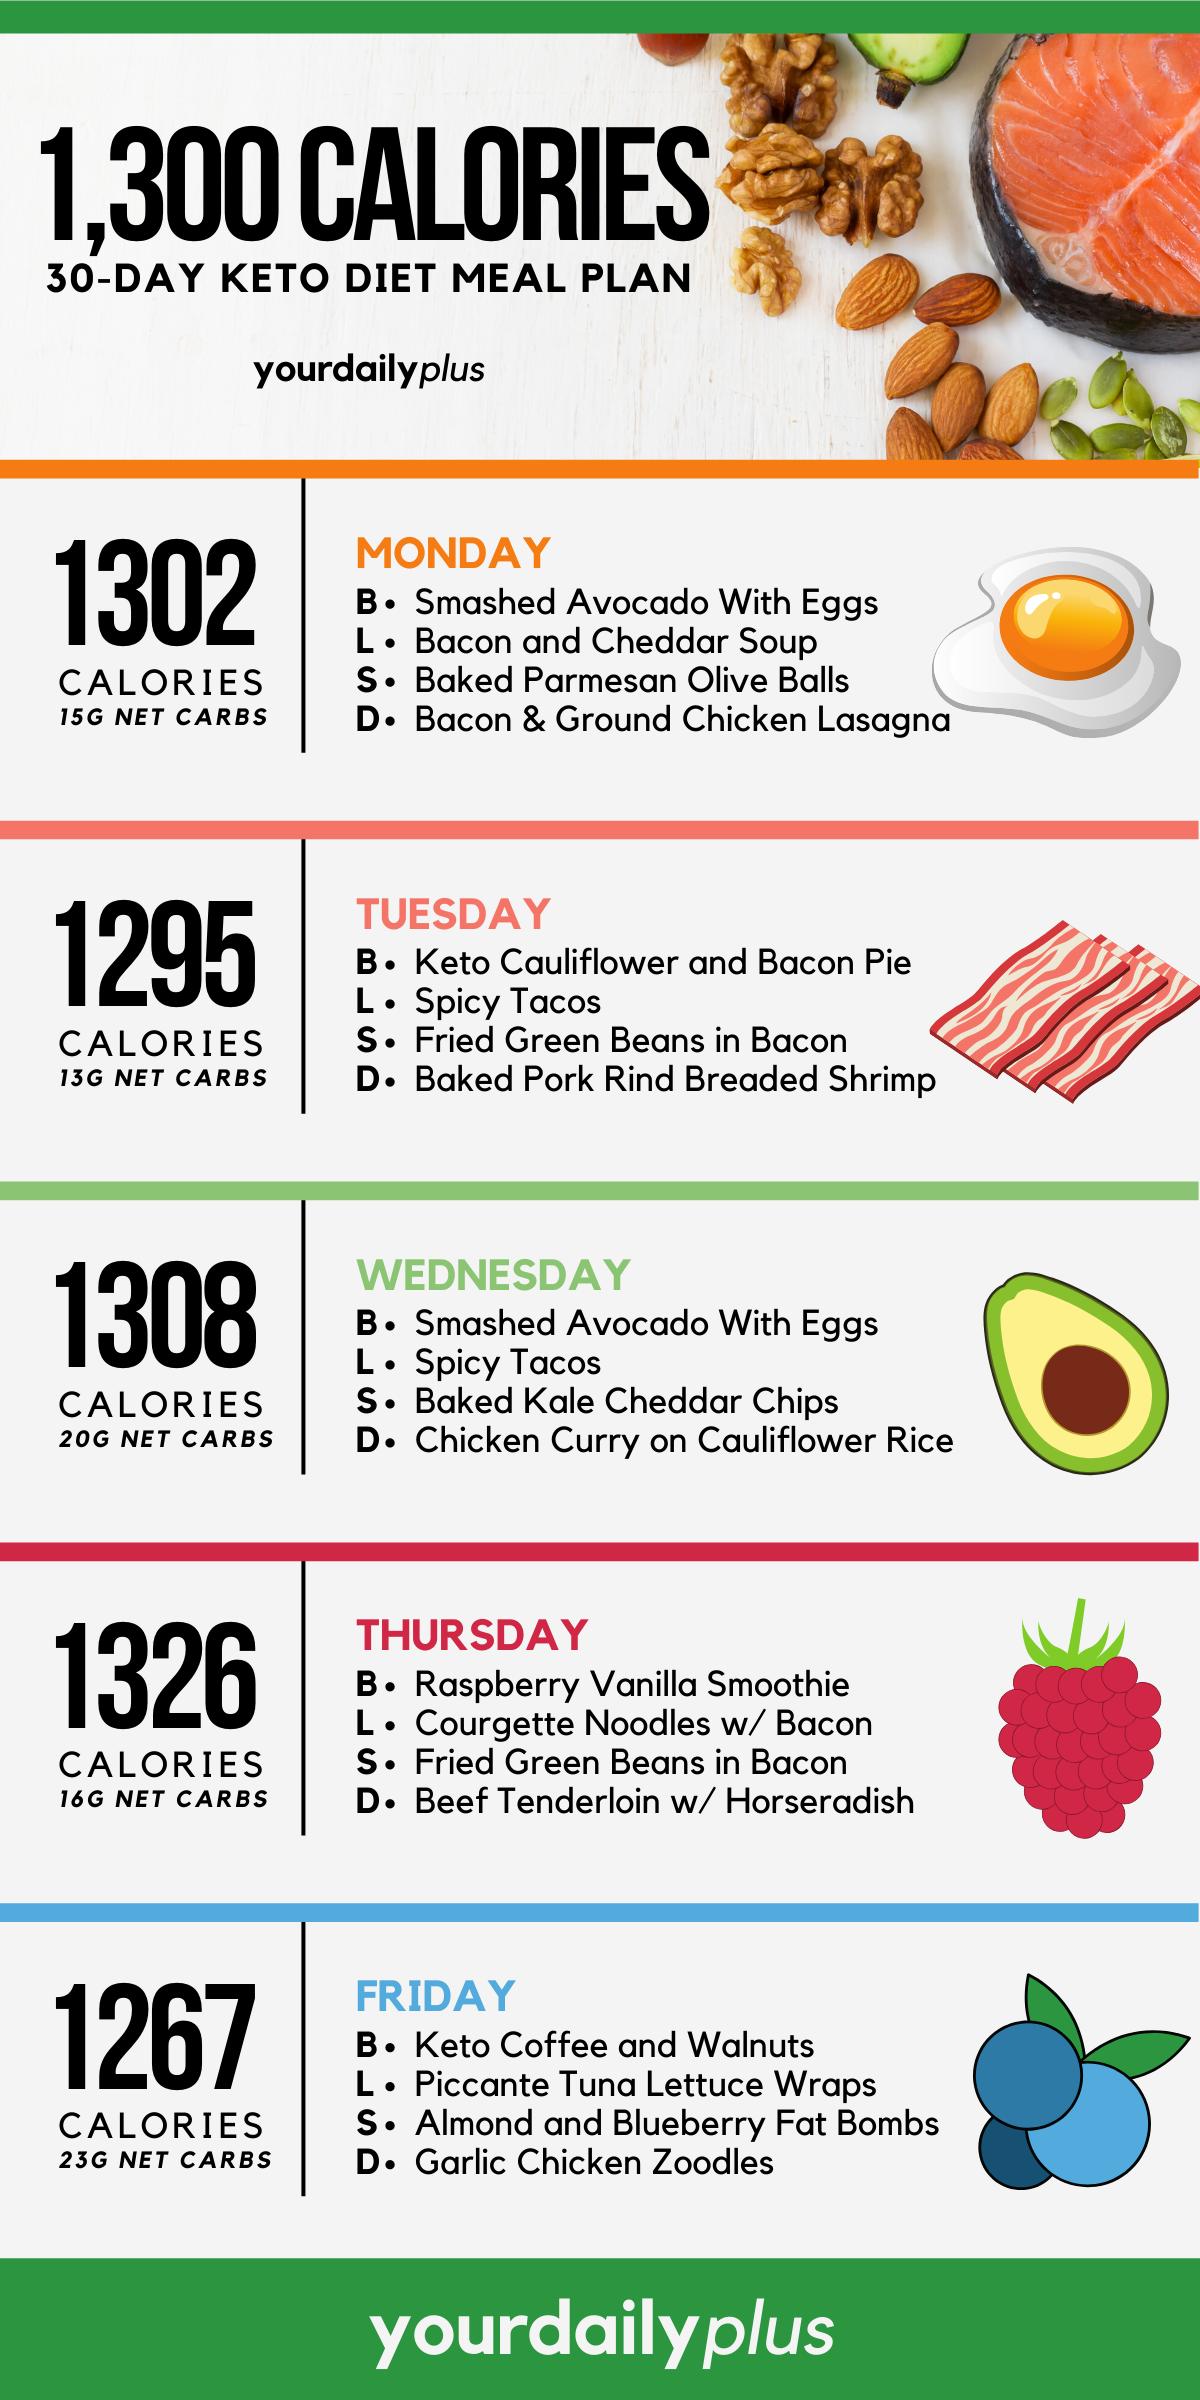 Keto Diet Menu 30 Day Keto Meal Plan For Beginners Ketogenic Diet Meal Plan Keto Diet Meal Plan Keto Meal Plan